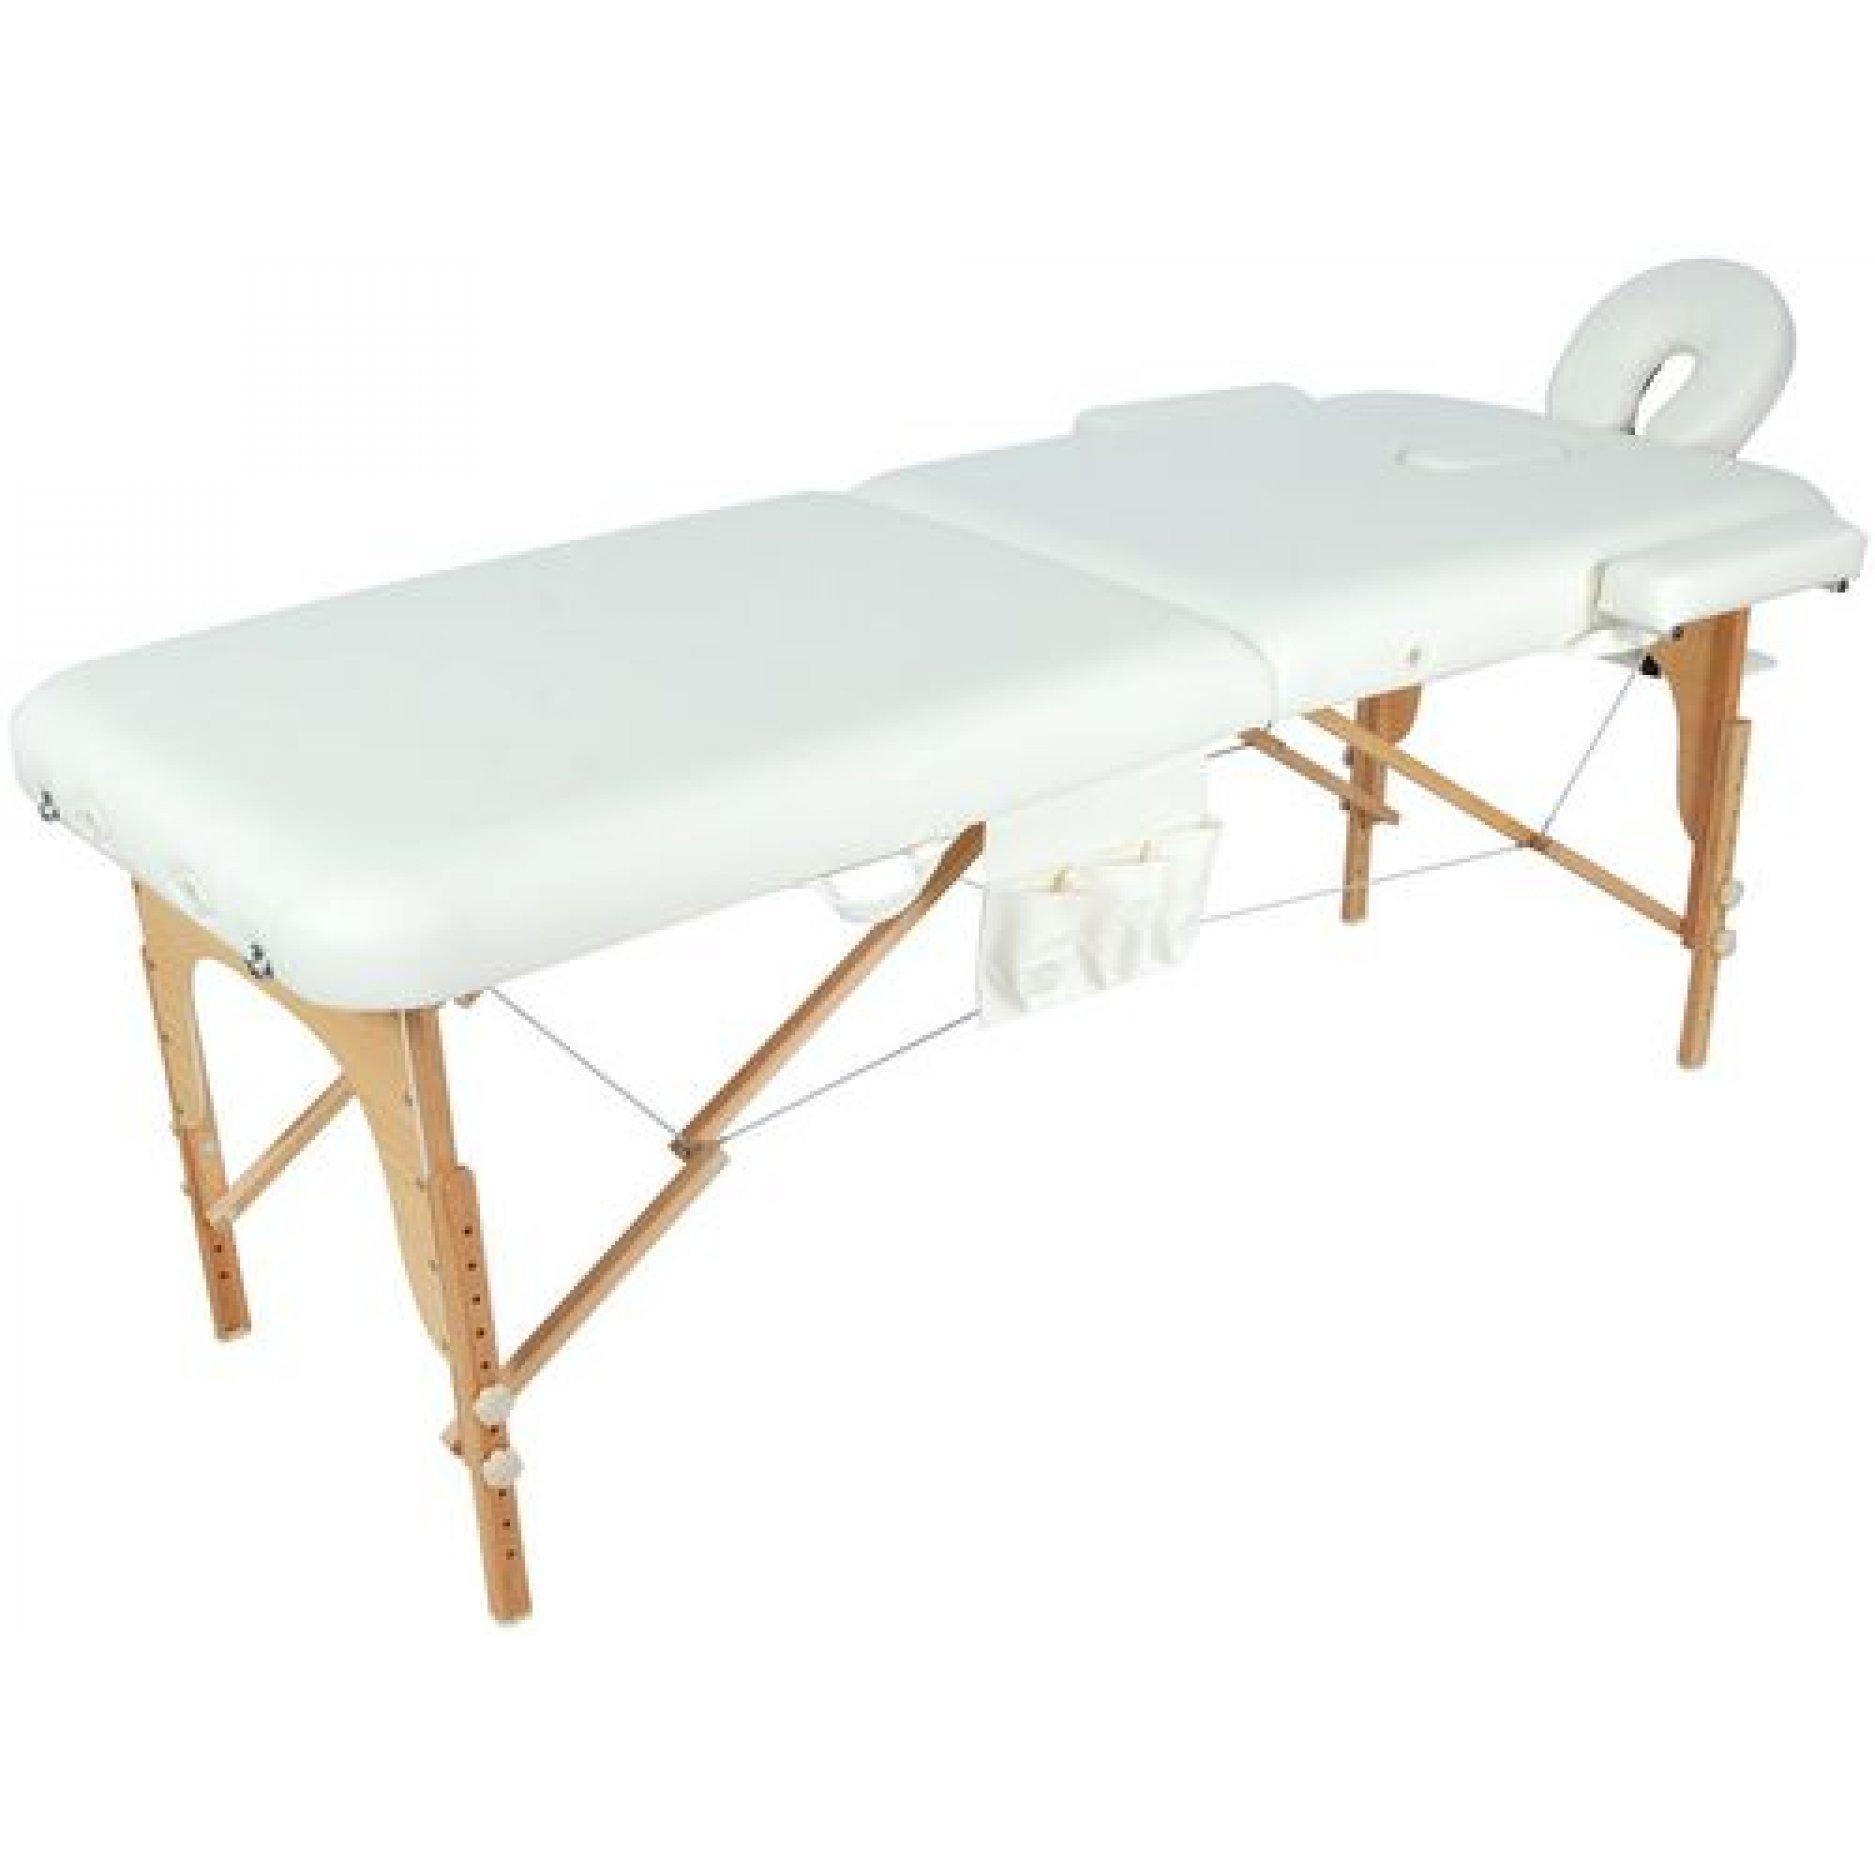 Массажный стол Medmos JF-AY01 2-х секционный (МСТ-003Л)